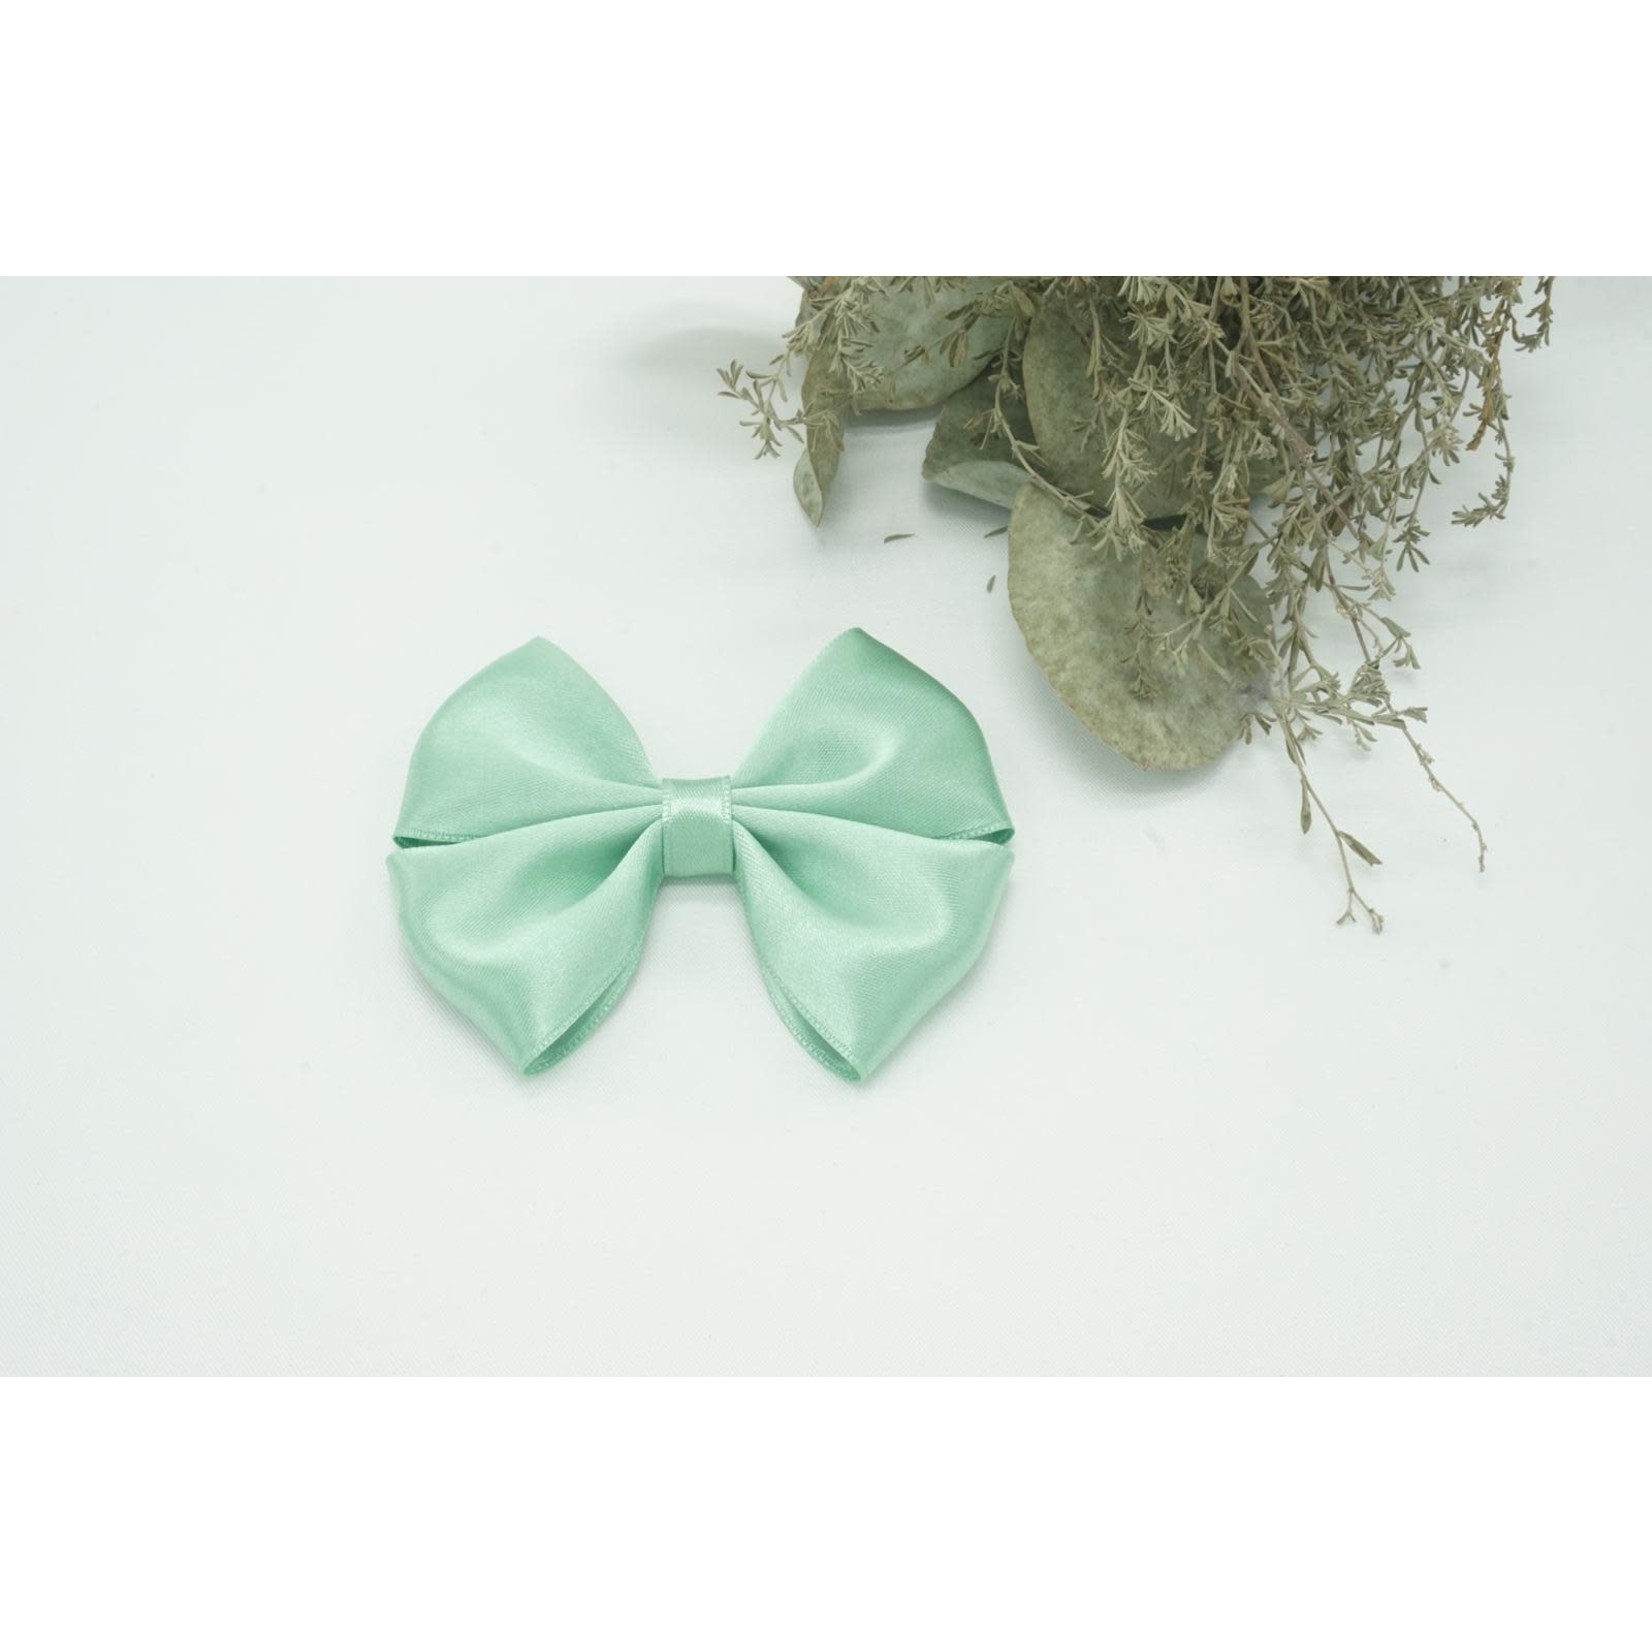 Petite Zara Satin Bow - Moss Green